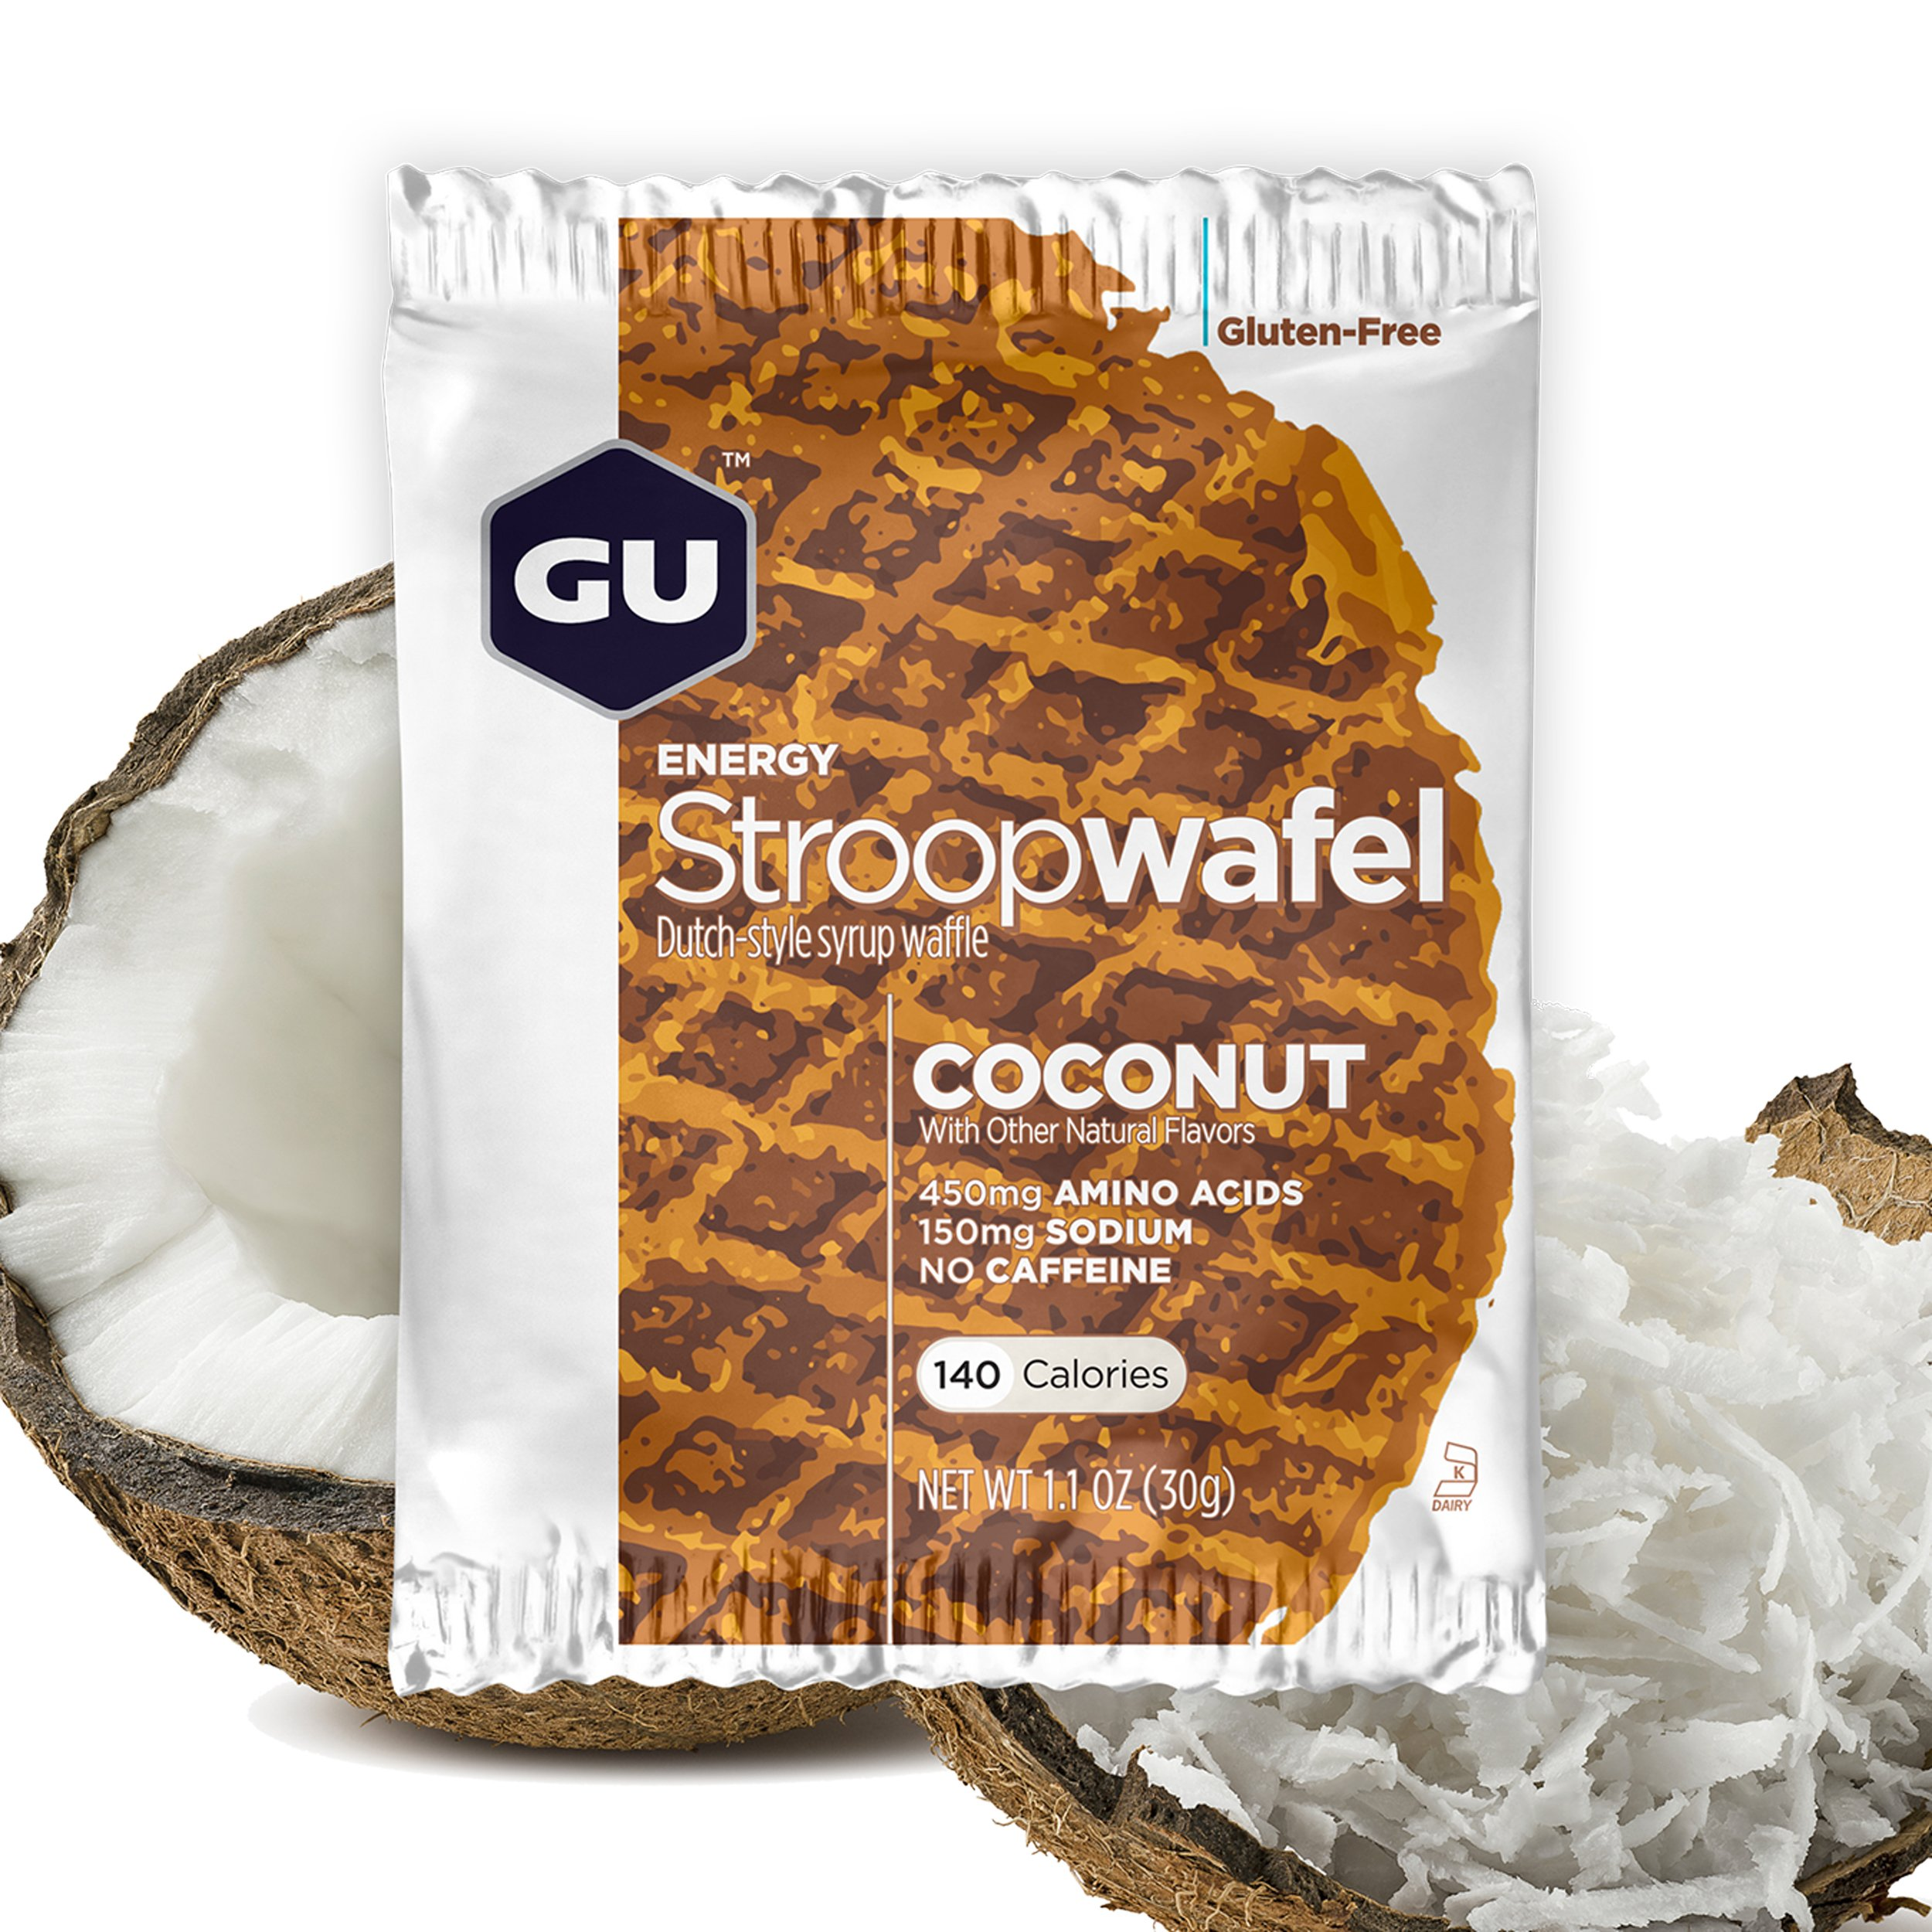 GU Energy Stroopwafel Sports Nutrition Waffle, Gluten Free Coconut, 16-Count